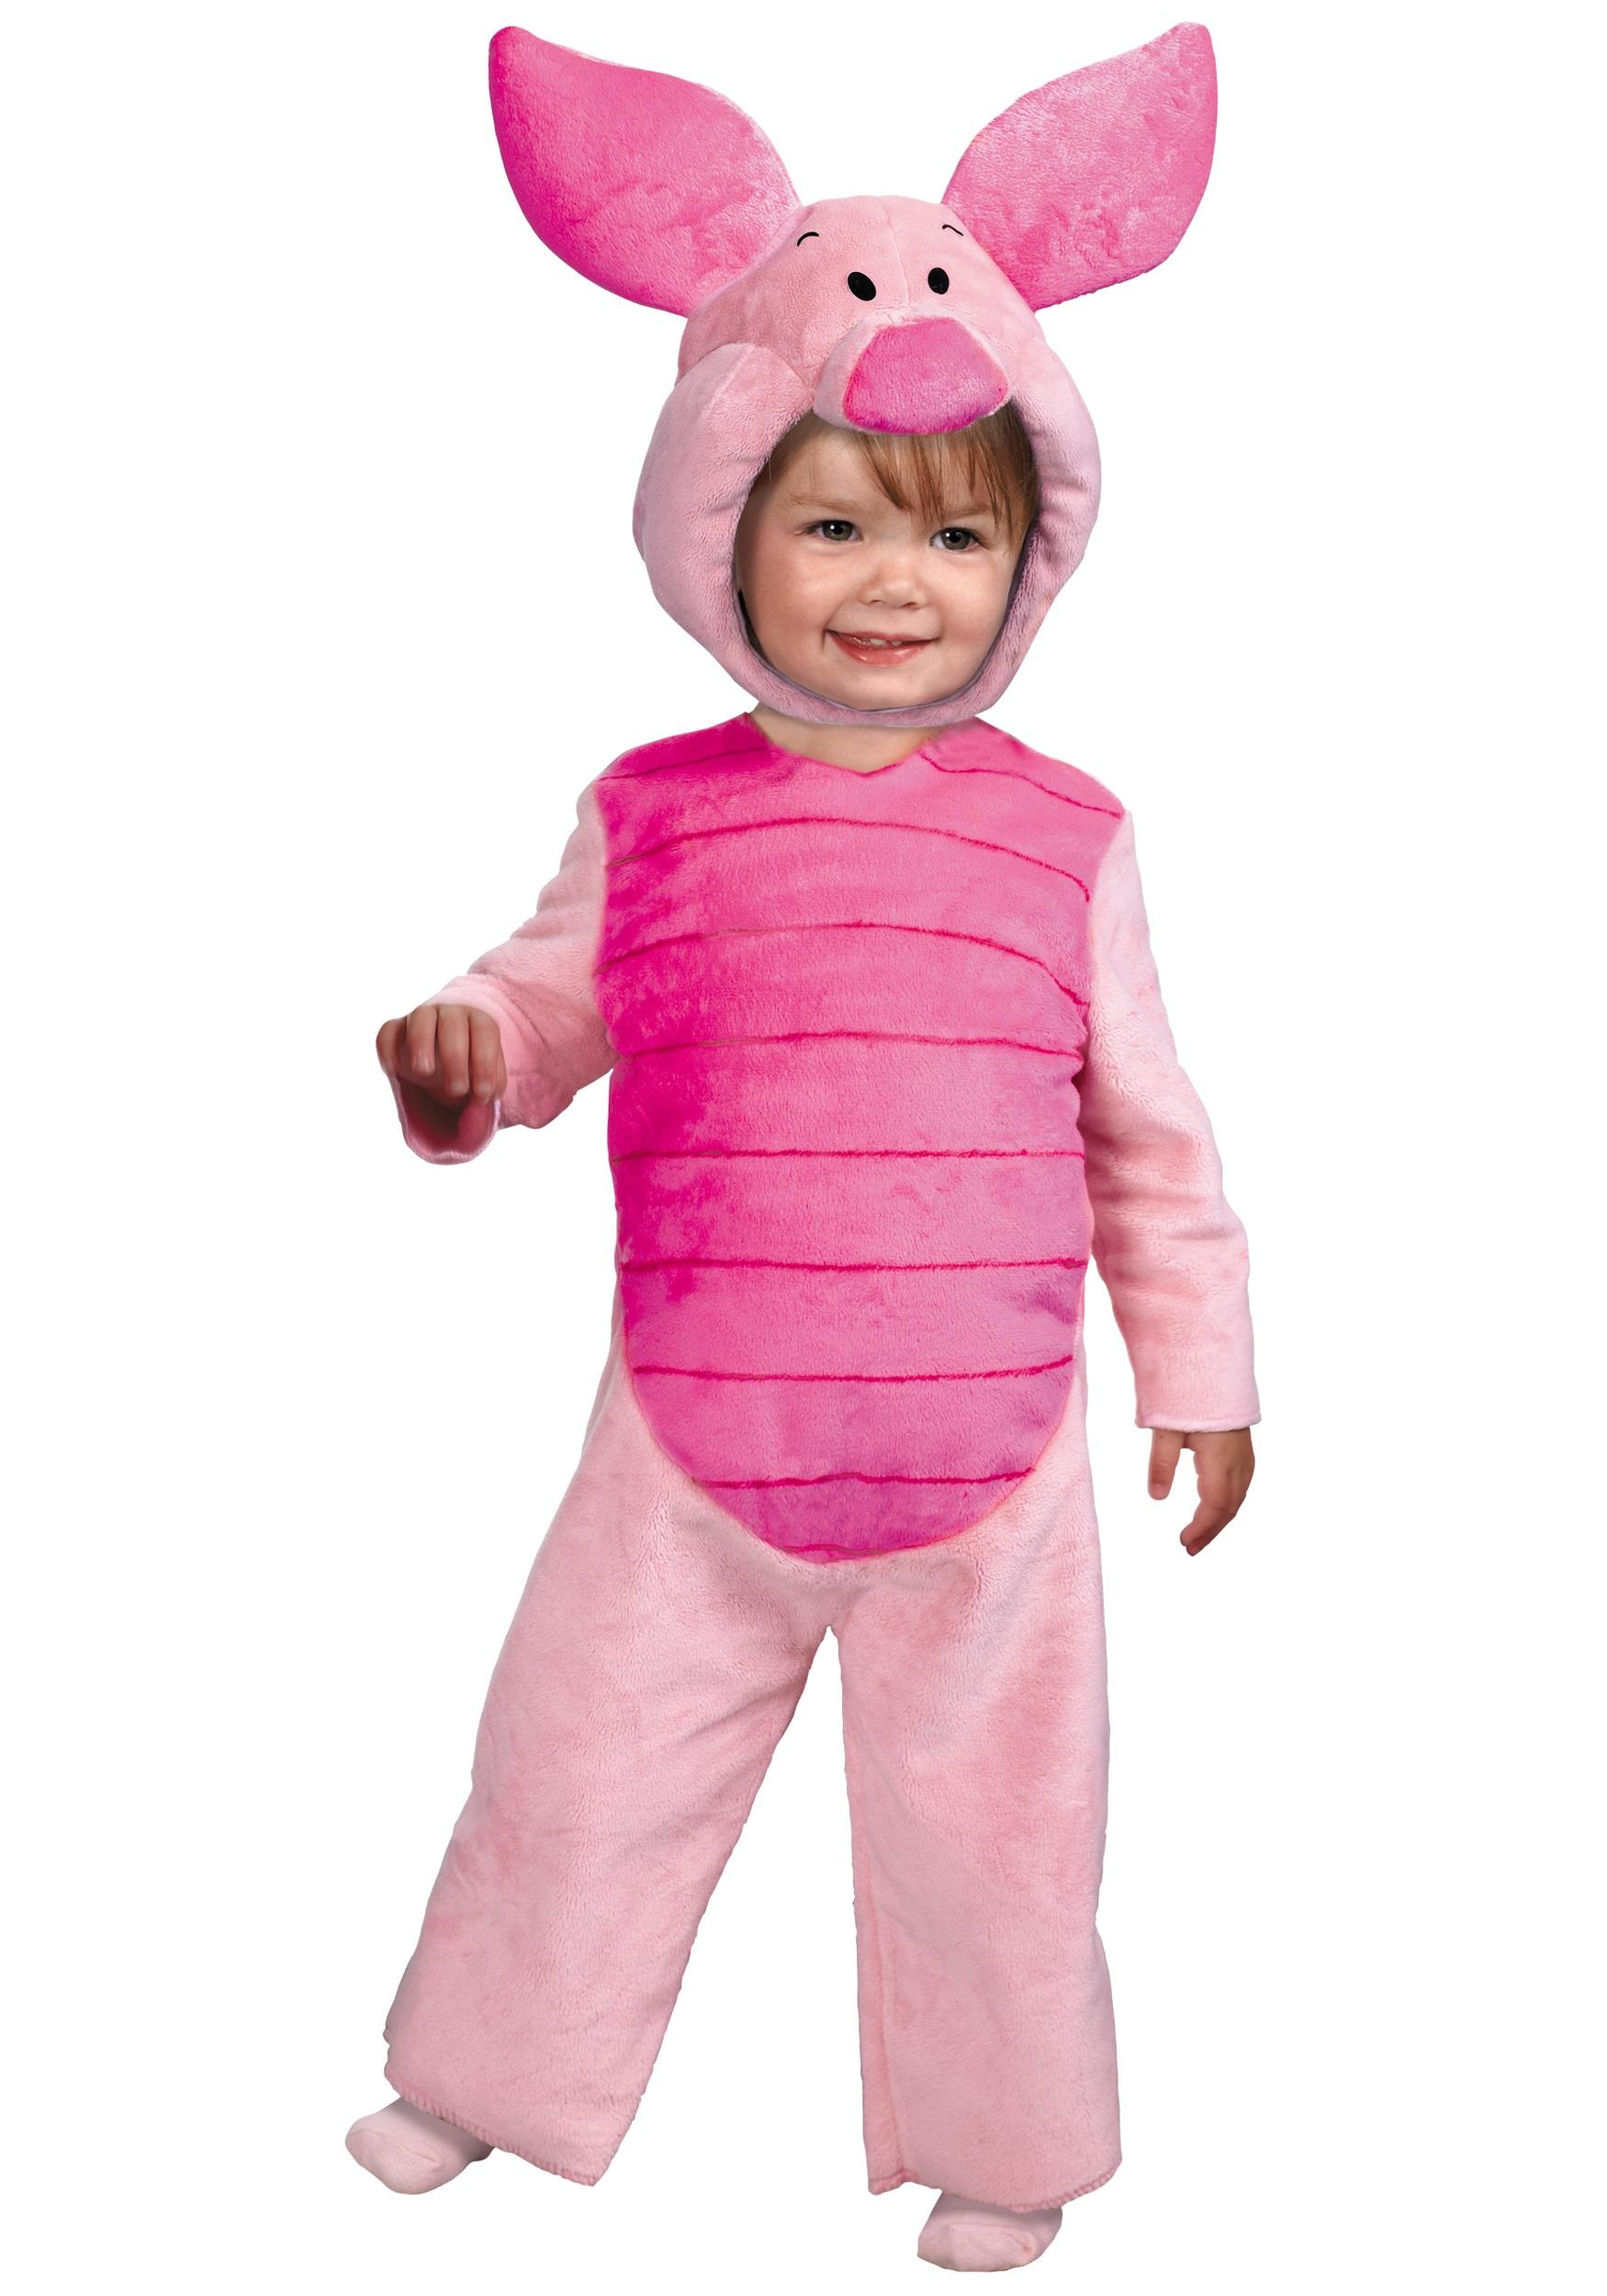 Toddler Piglet Costume - Halloween Costumes